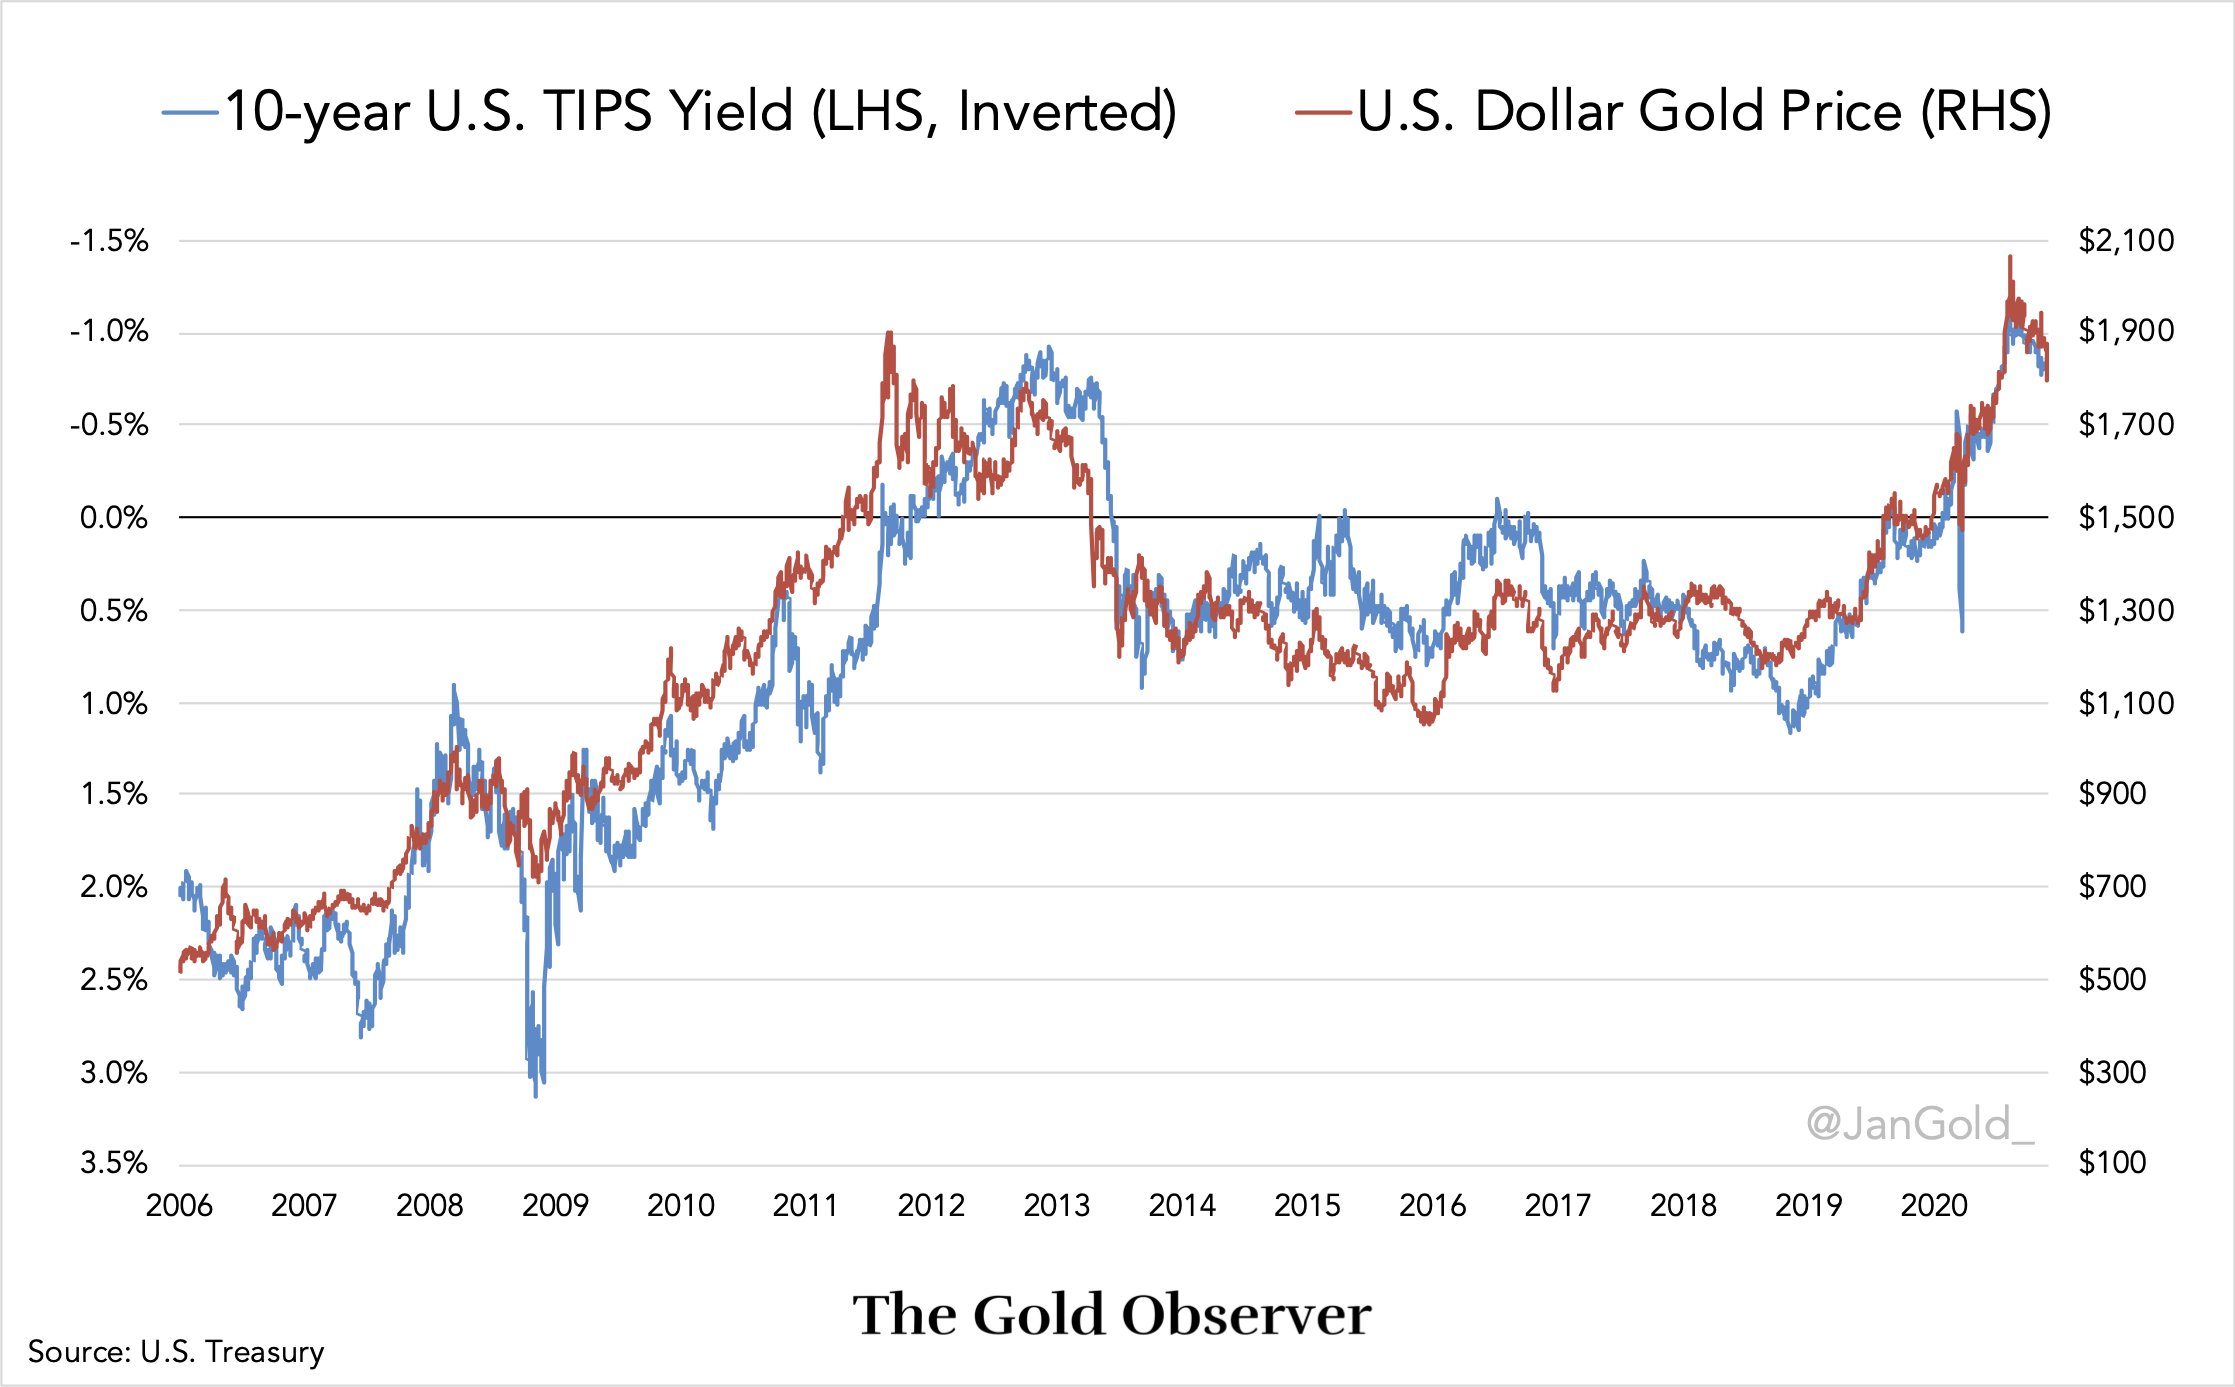 U.S. 10 Year Treasuries Negative Yield vs. Gold